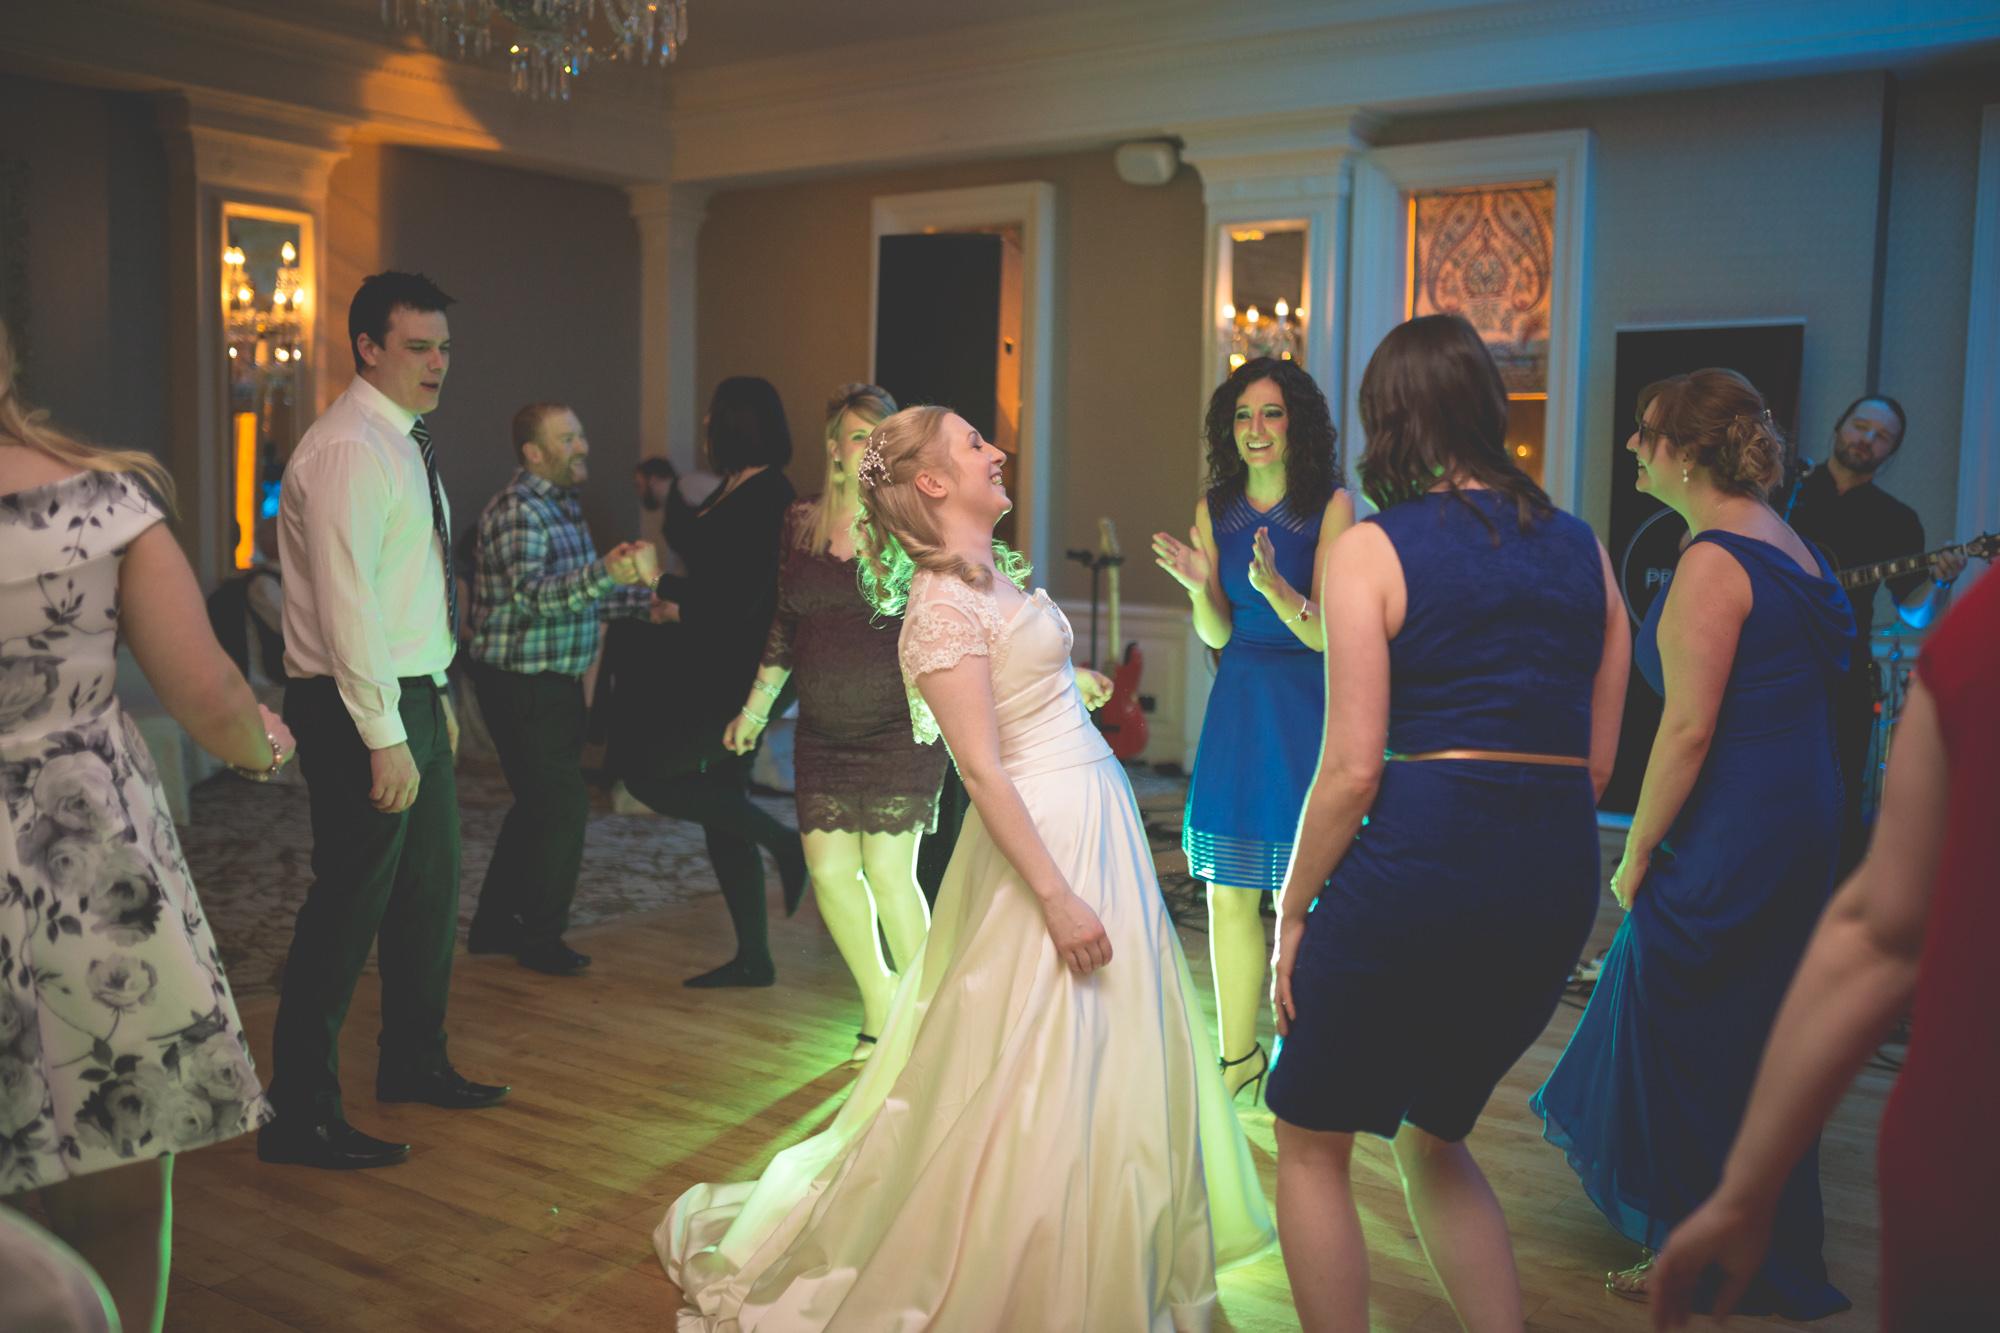 Steve_Emma_Dancing-46.jpg